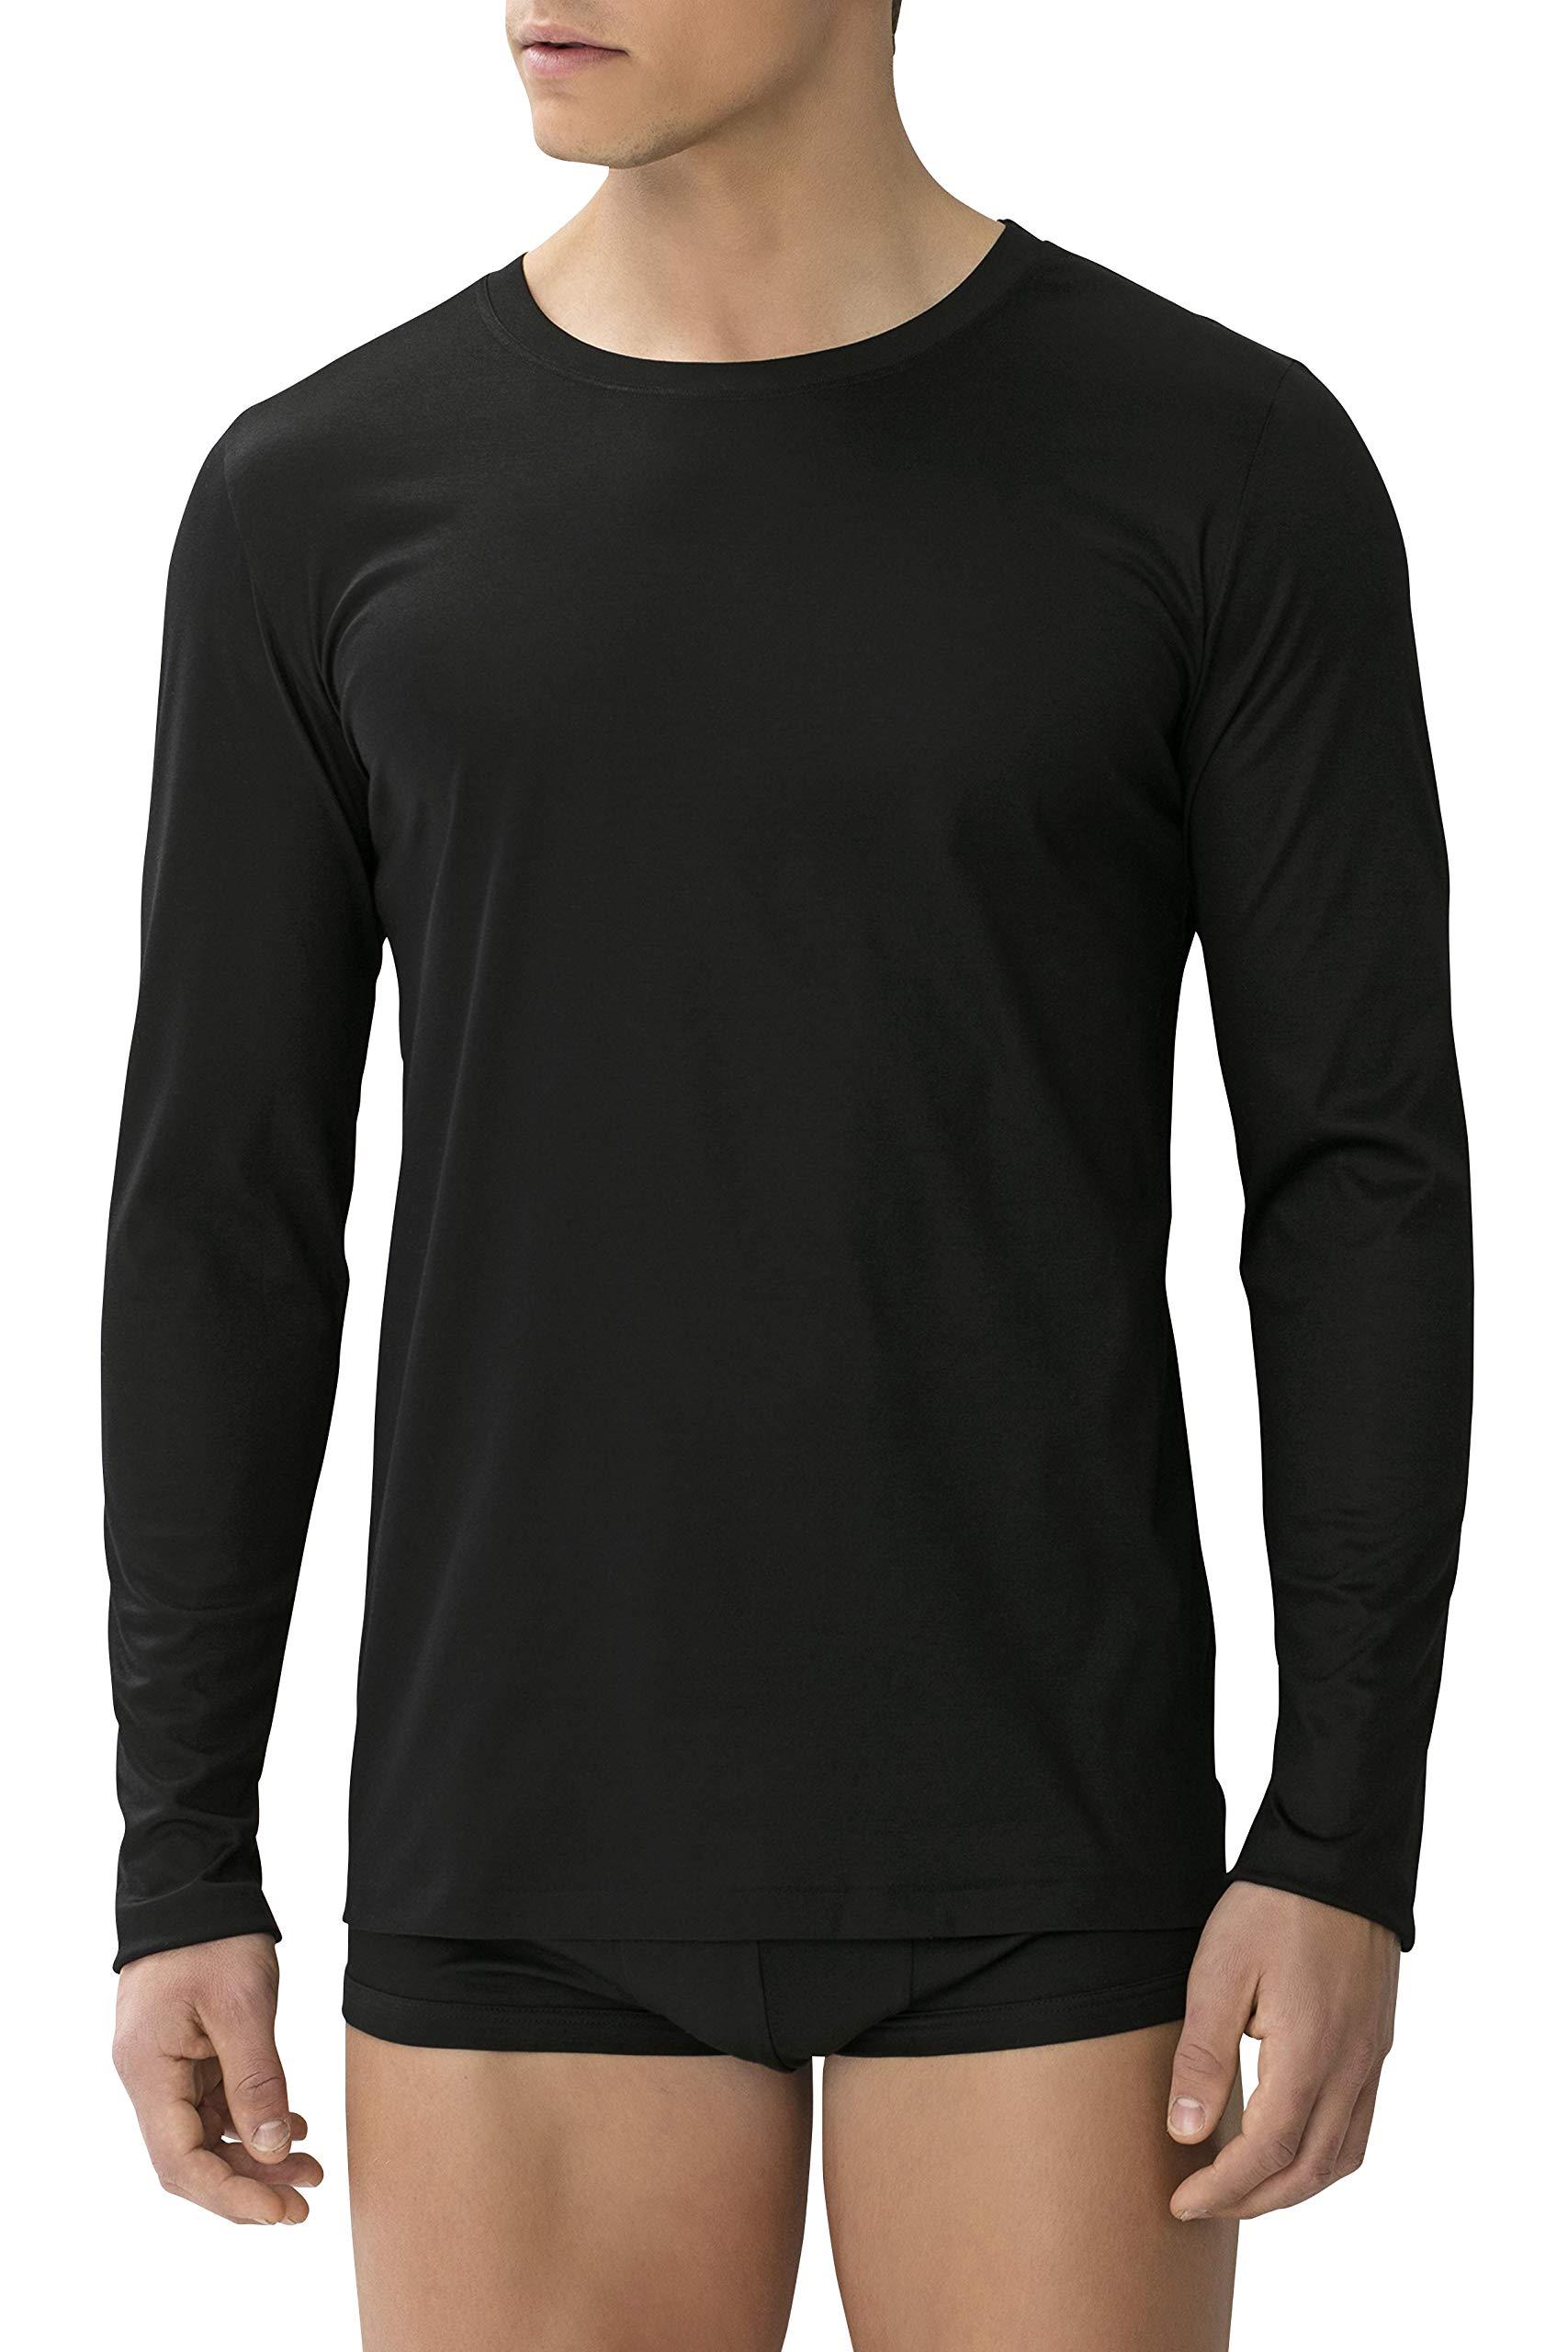 Zimmerli of Switzerland SEA Island Mens Long Sleeve Crew TEE Shirt M Black